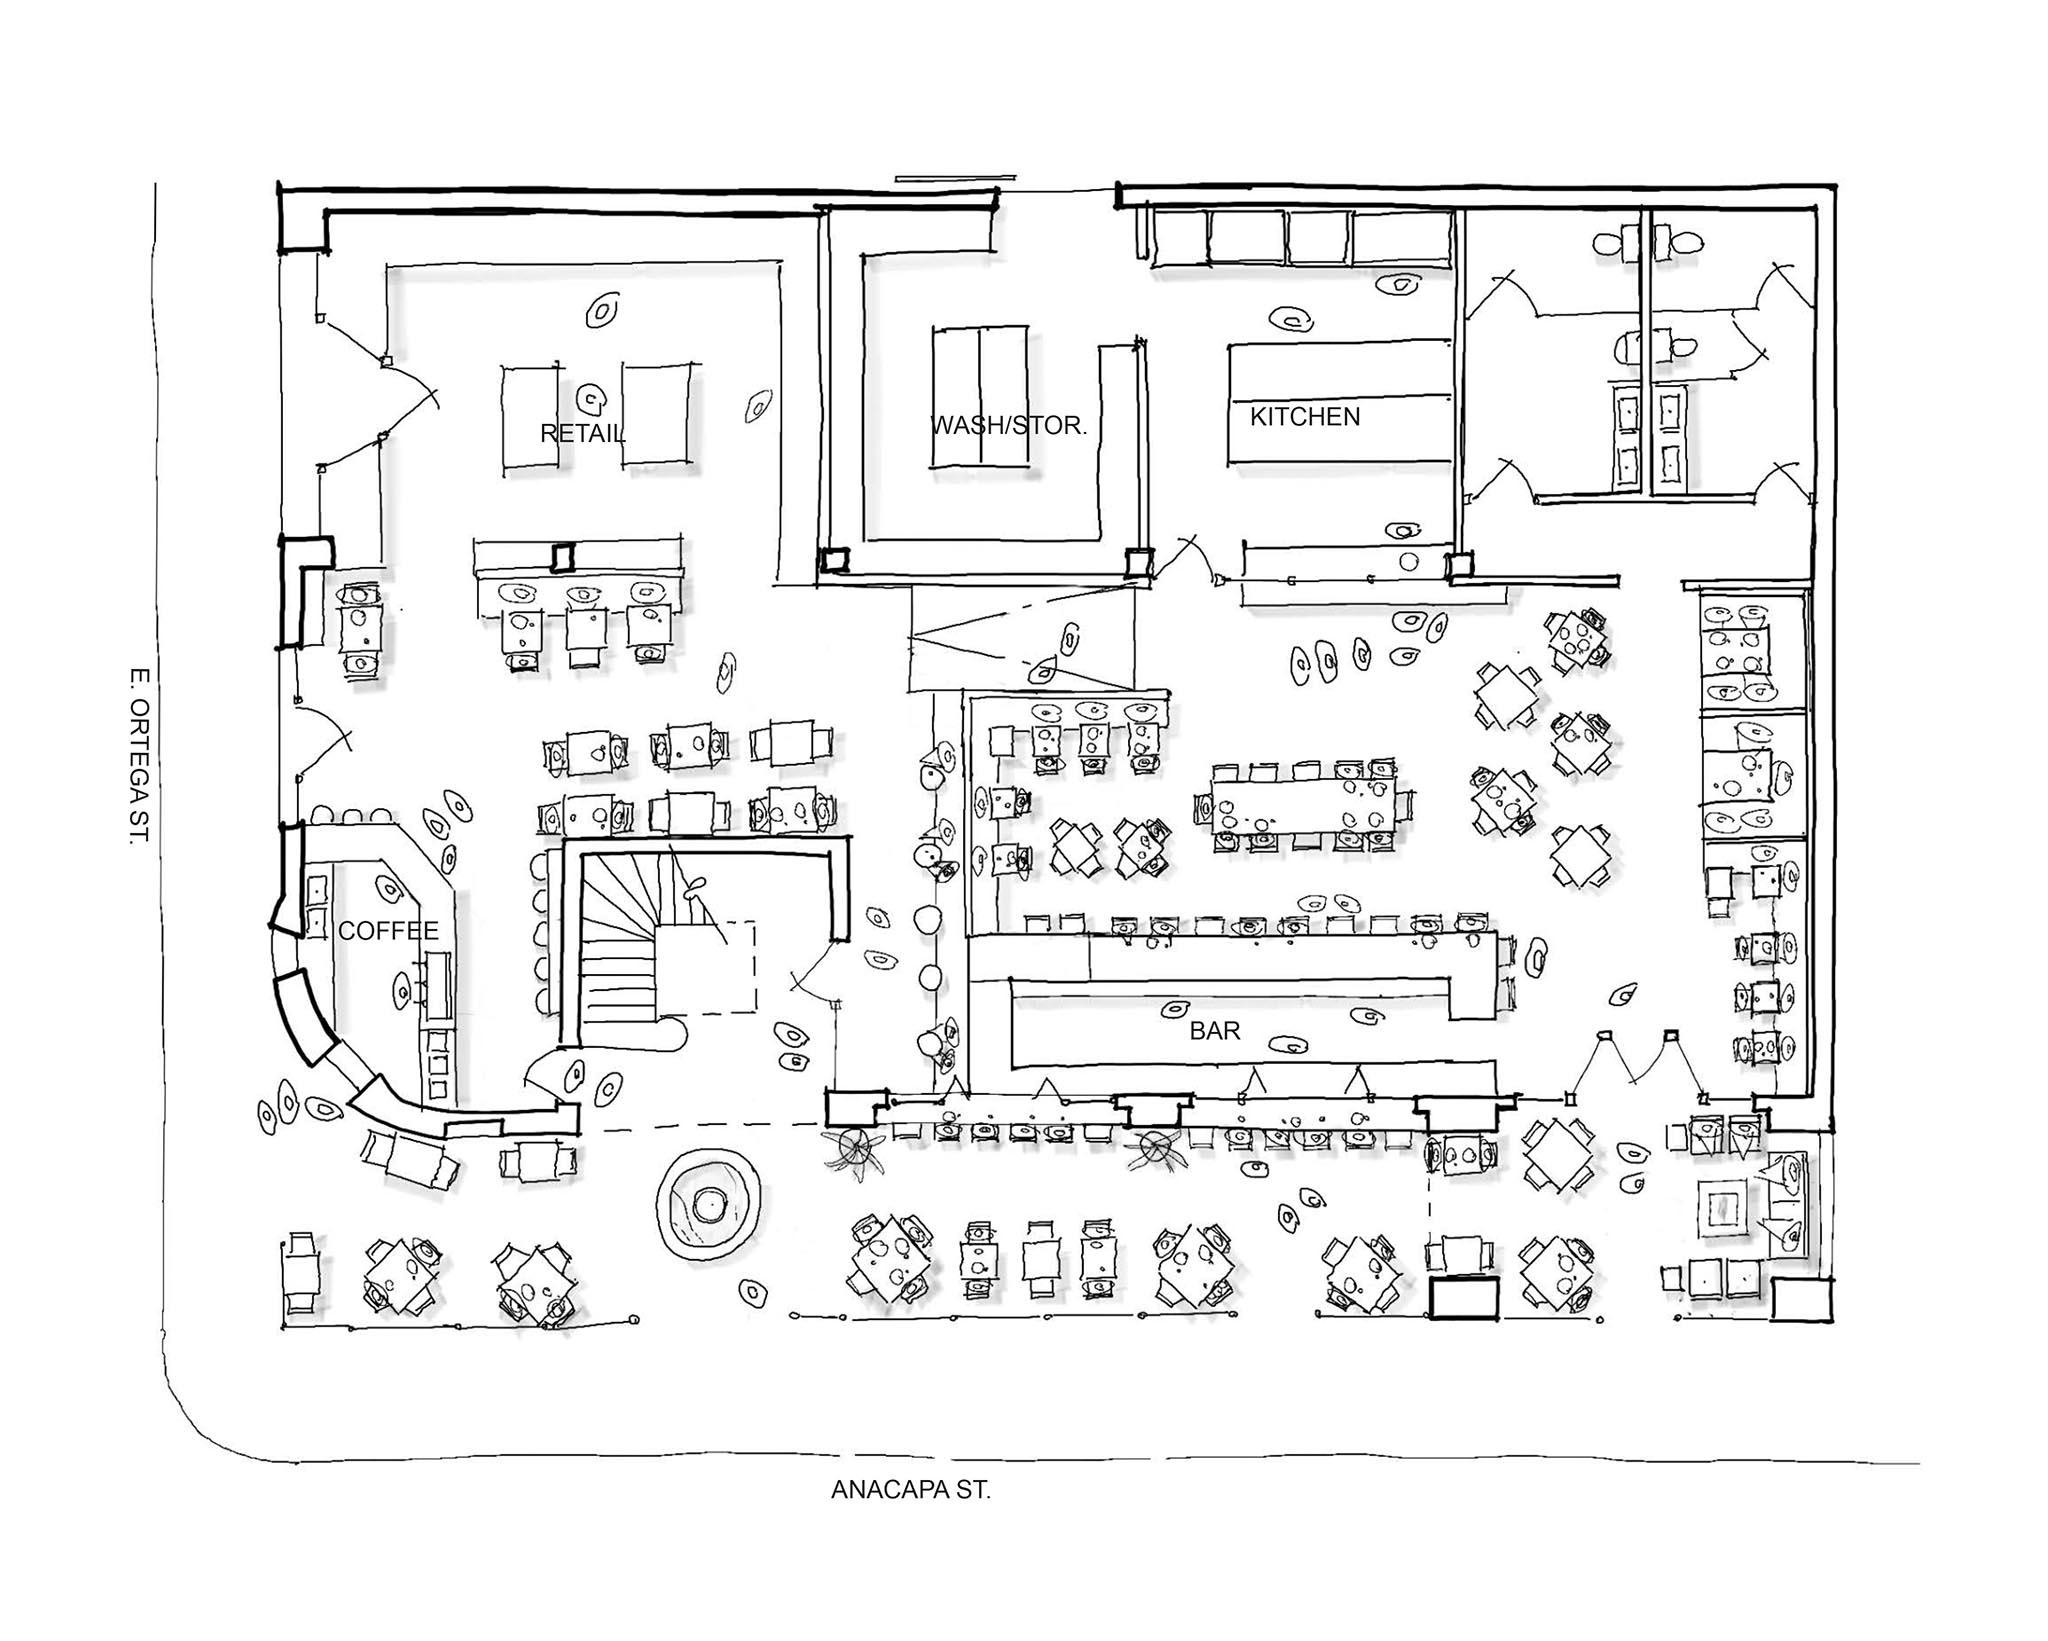 Ground Floor Food & Beverage / Retail